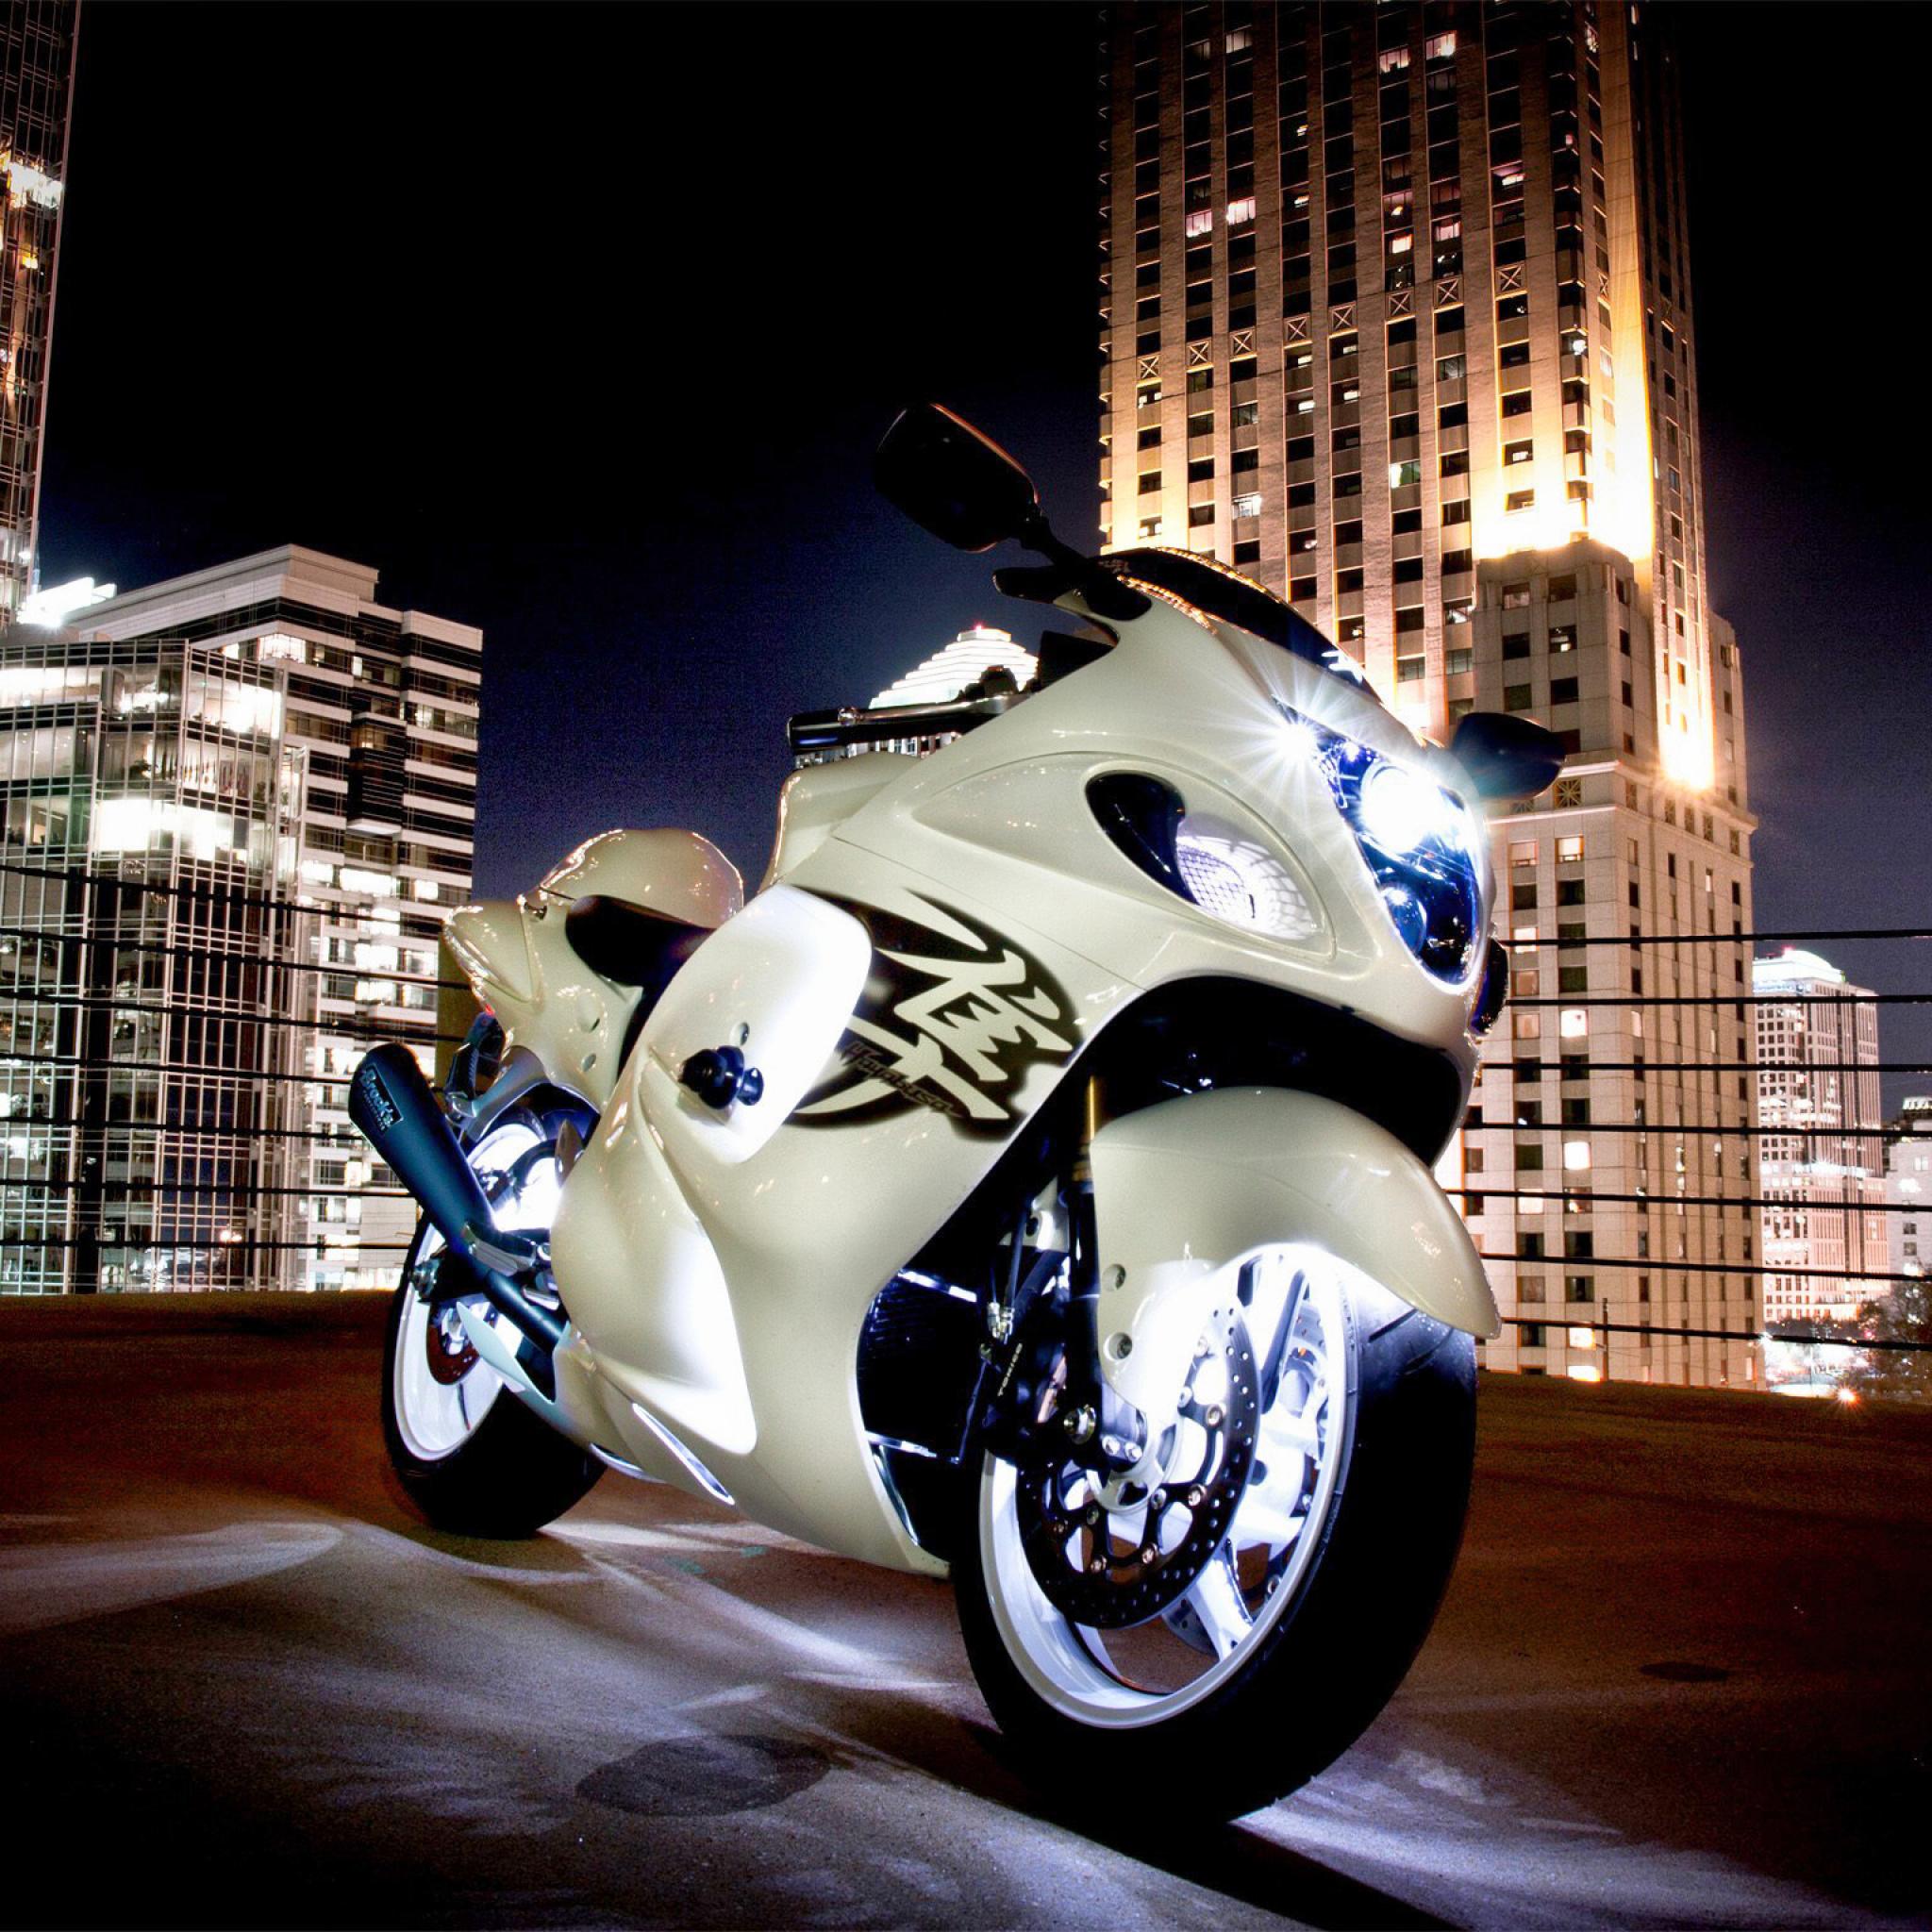 город германии, картинки с мотоциклами на телефон дне водоёма